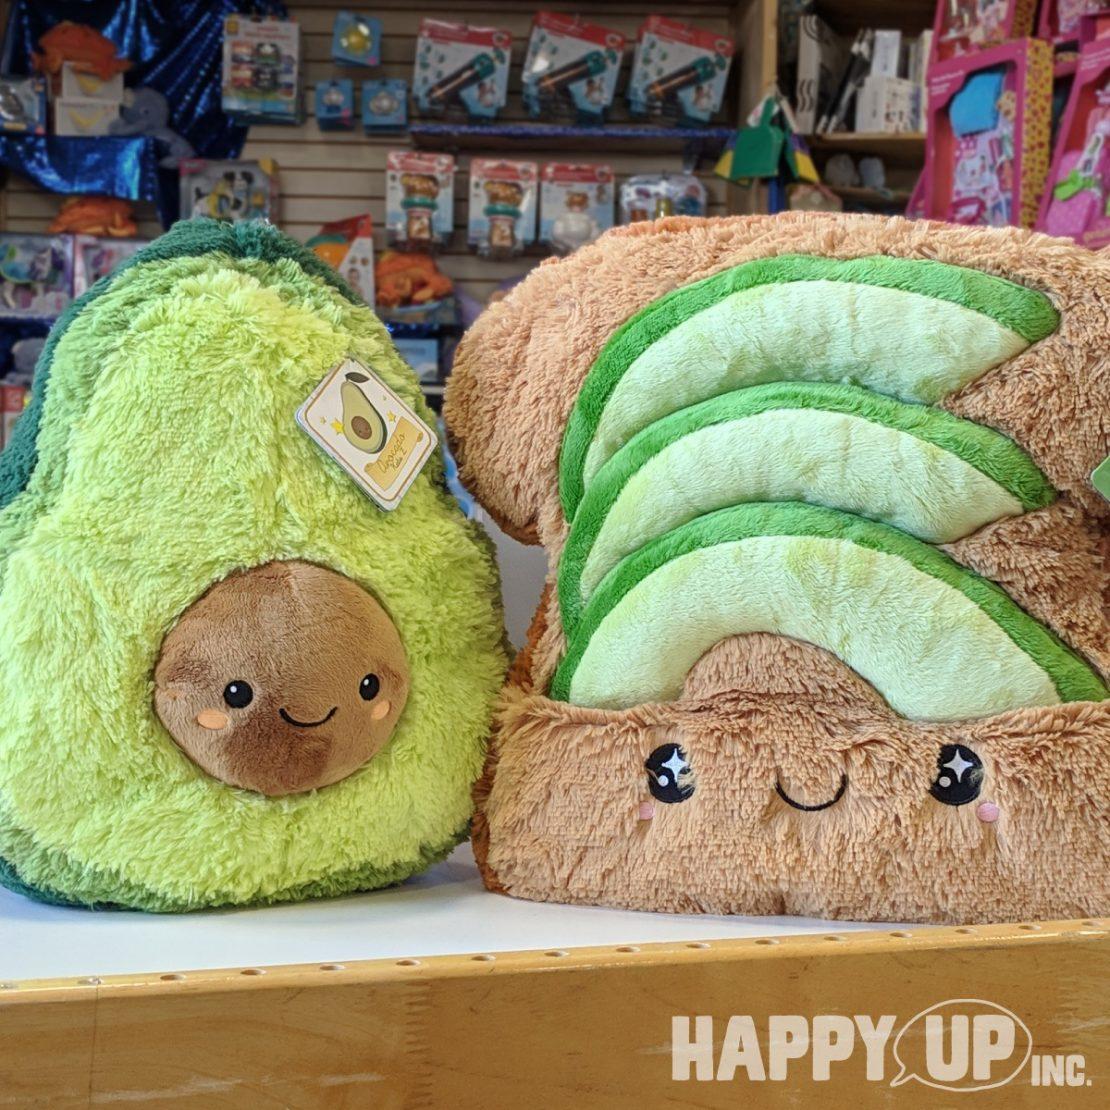 Squishable Avocado and Avocado Toast